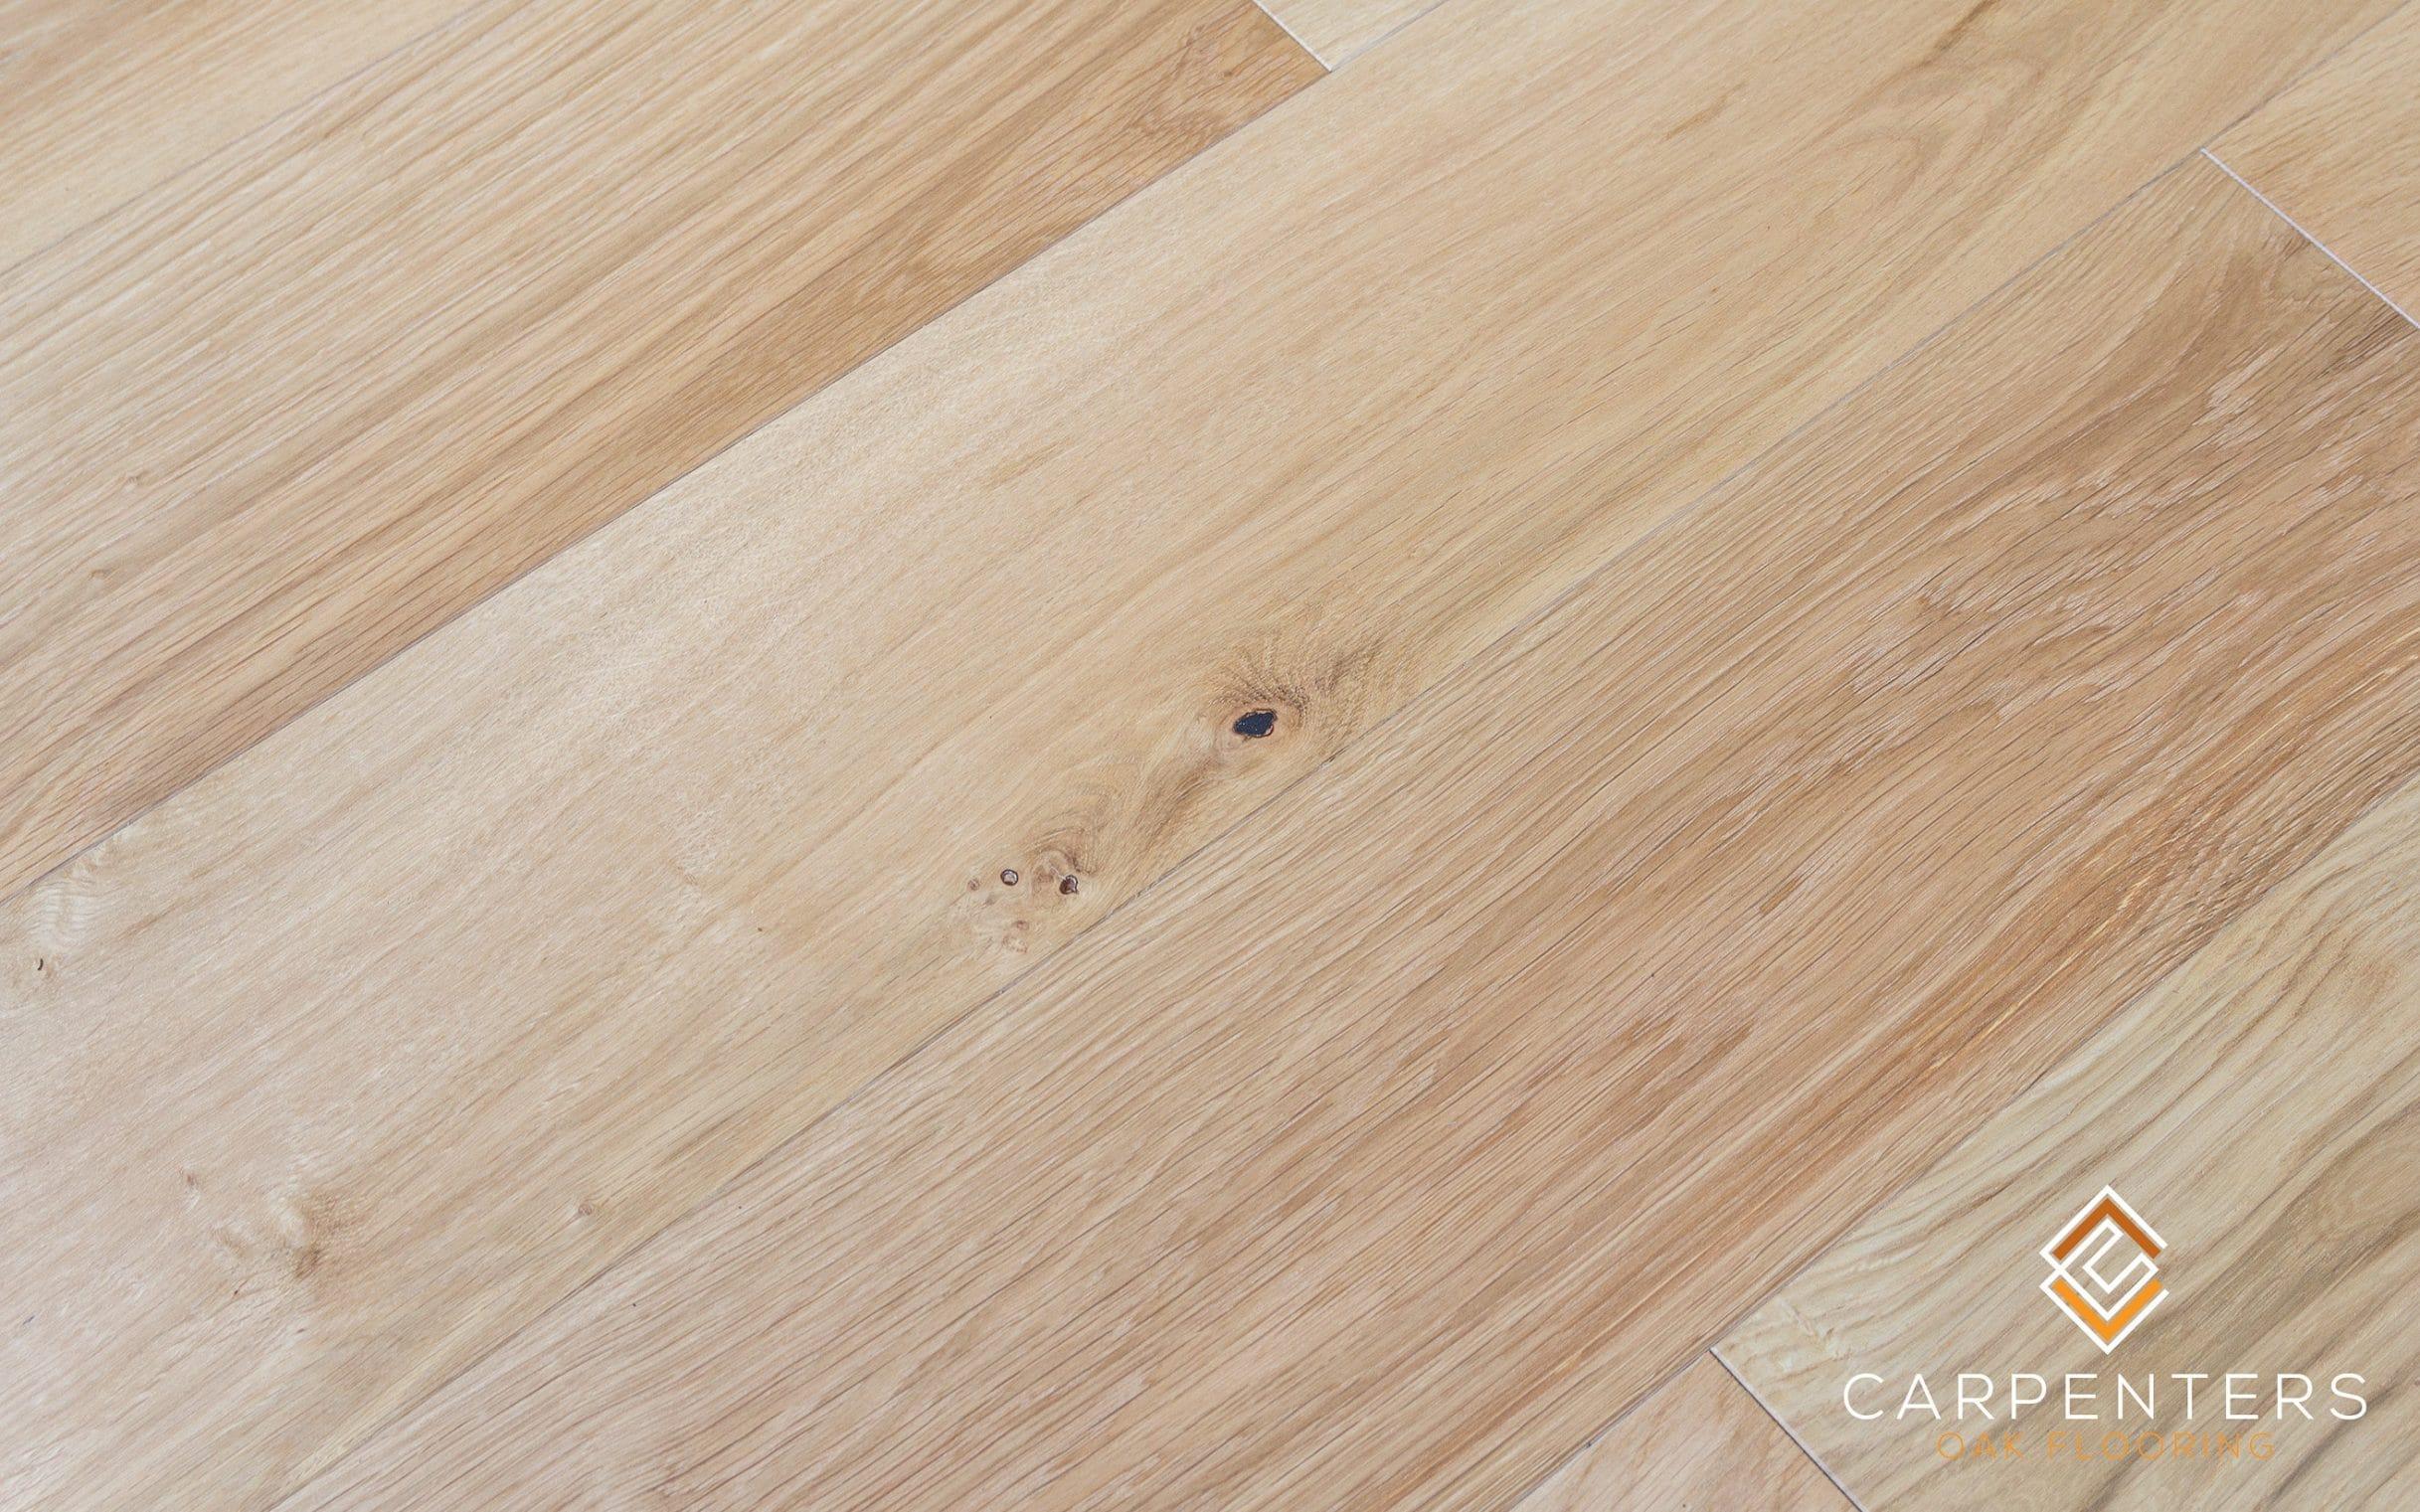 Carpenters Solid Oak Lacquered 150